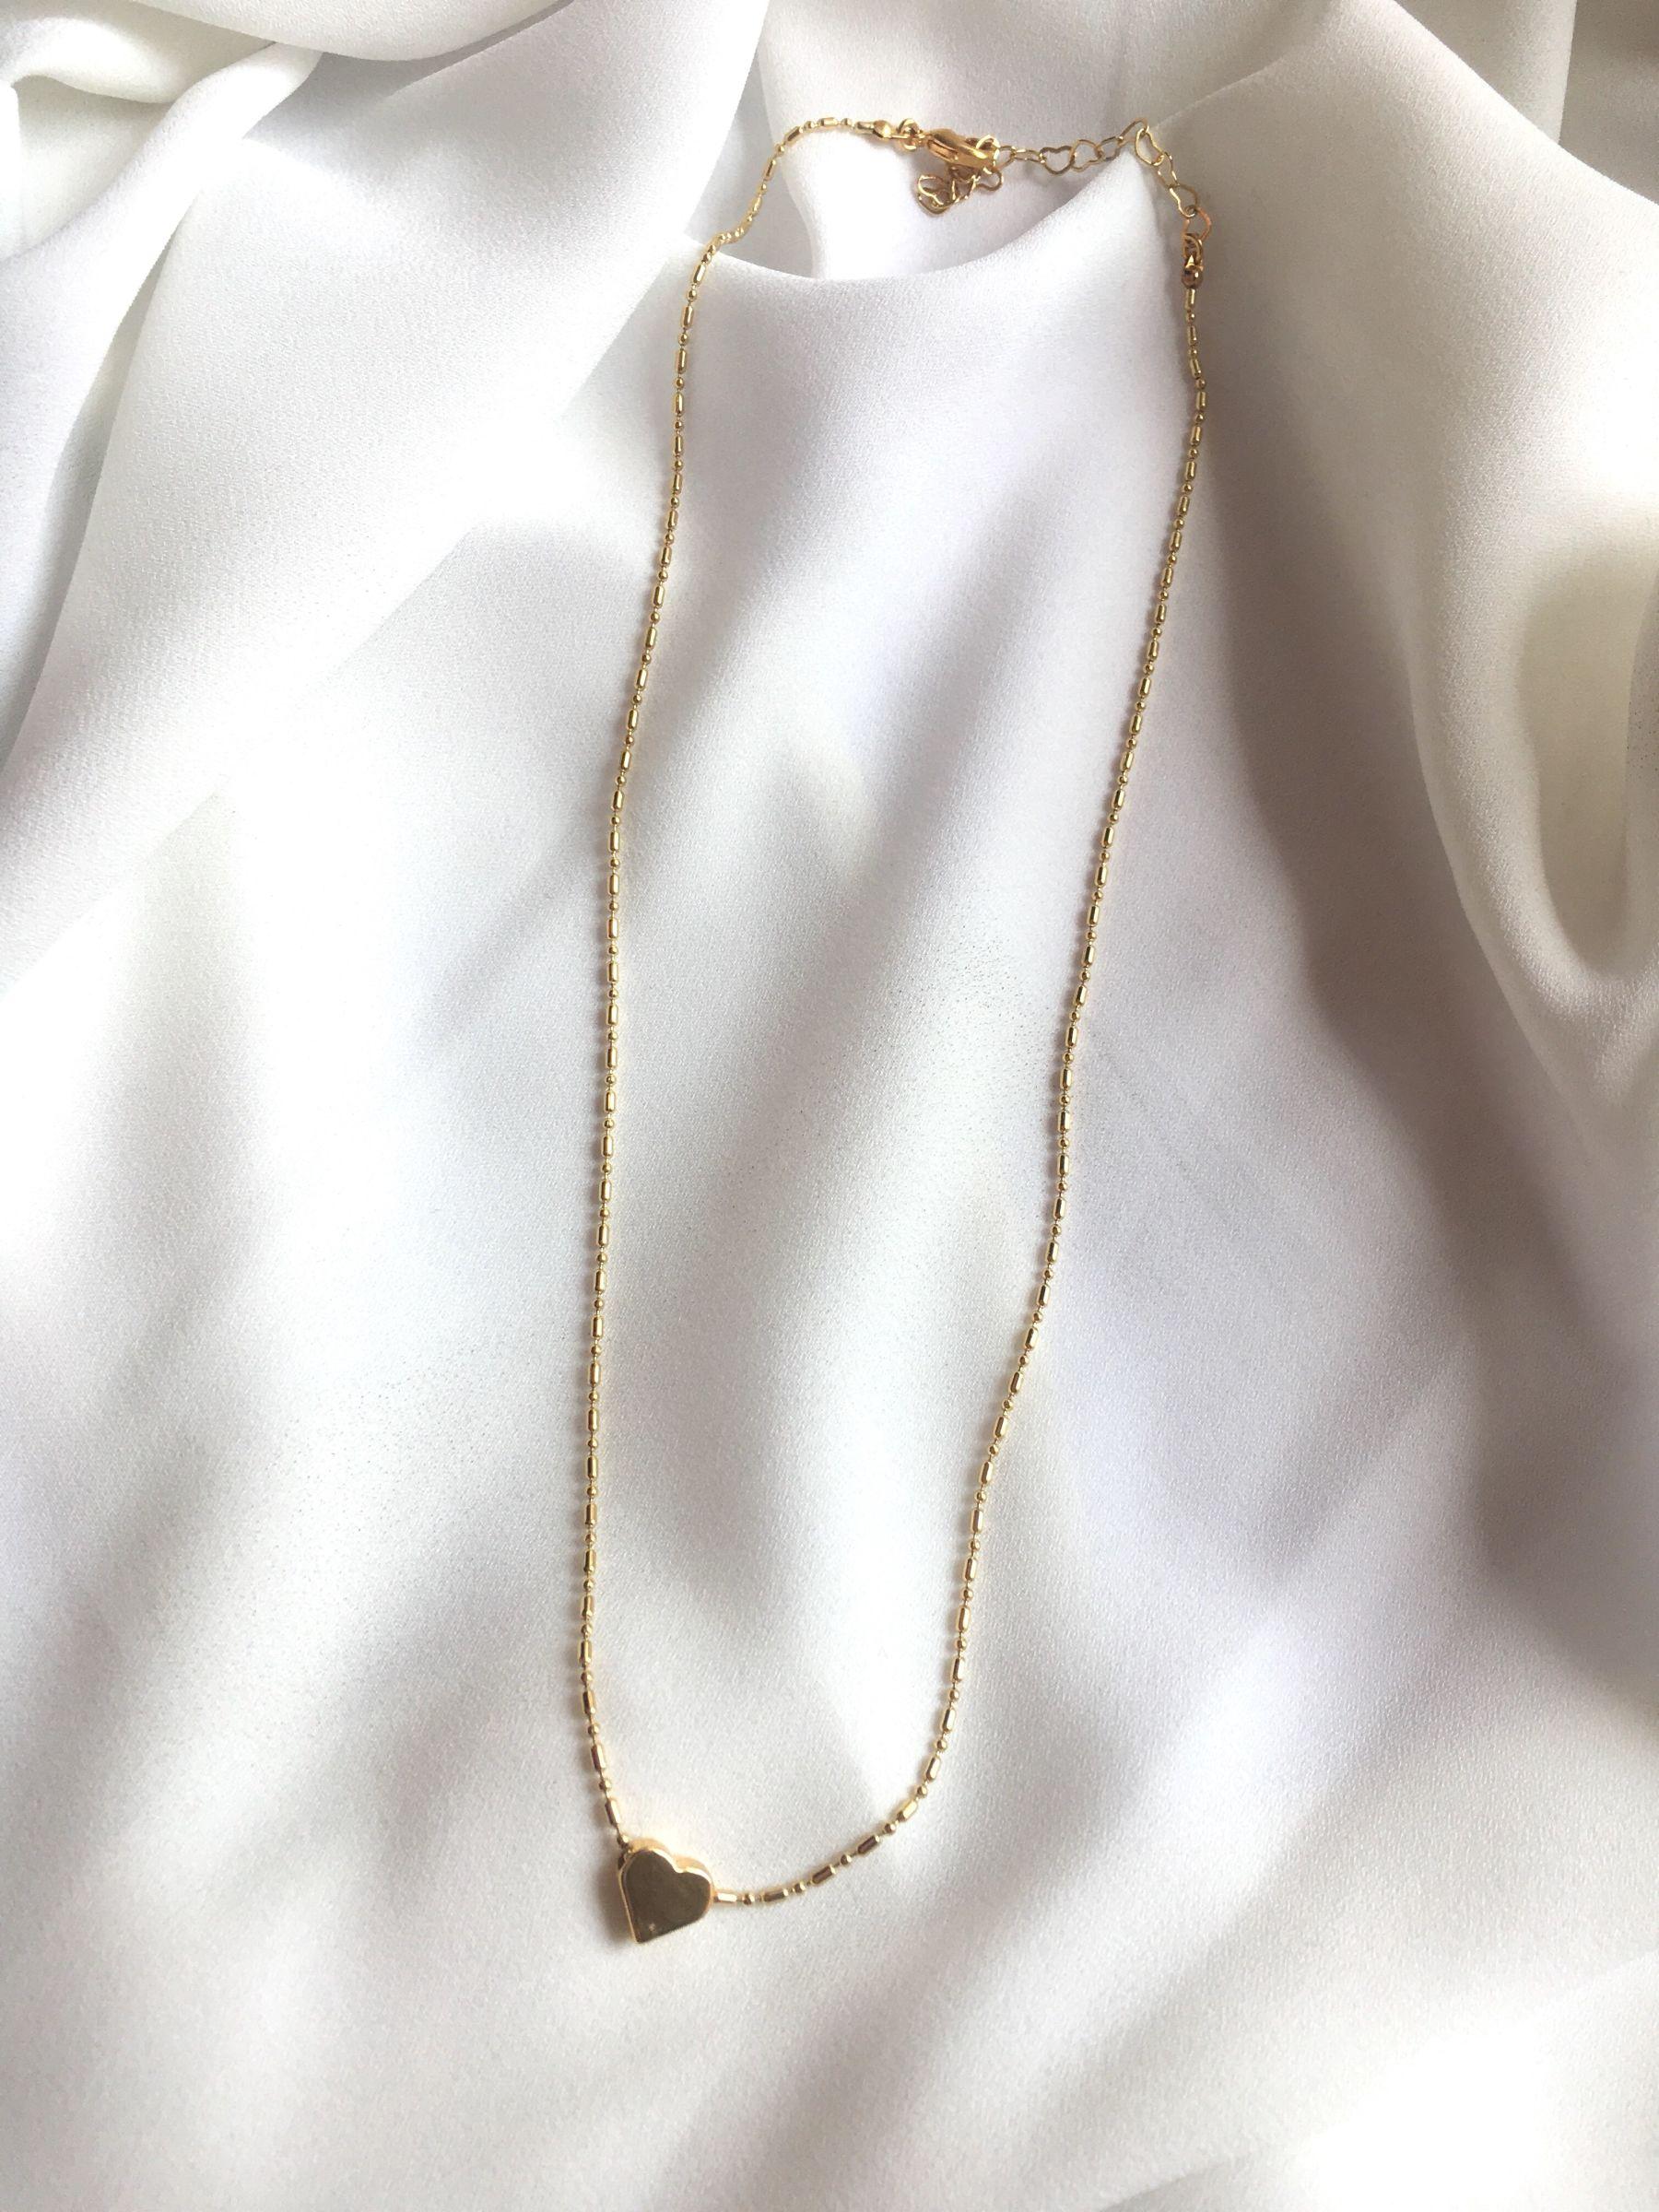 Collar Gold 24K Corazon